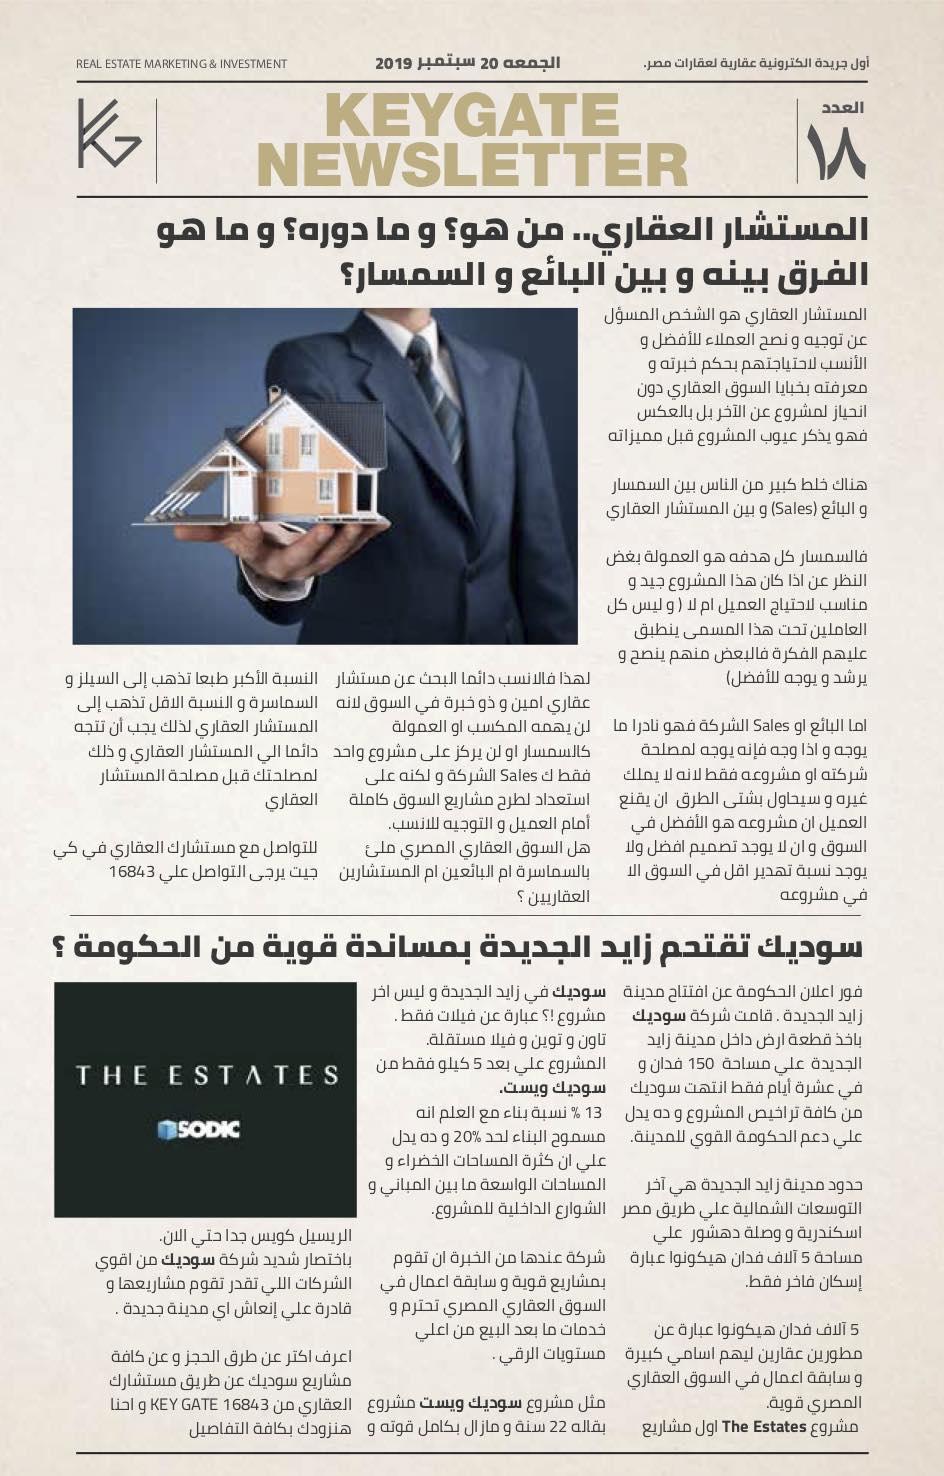 KeyGate Real Estate Newspaper 20 September 2019 1.0